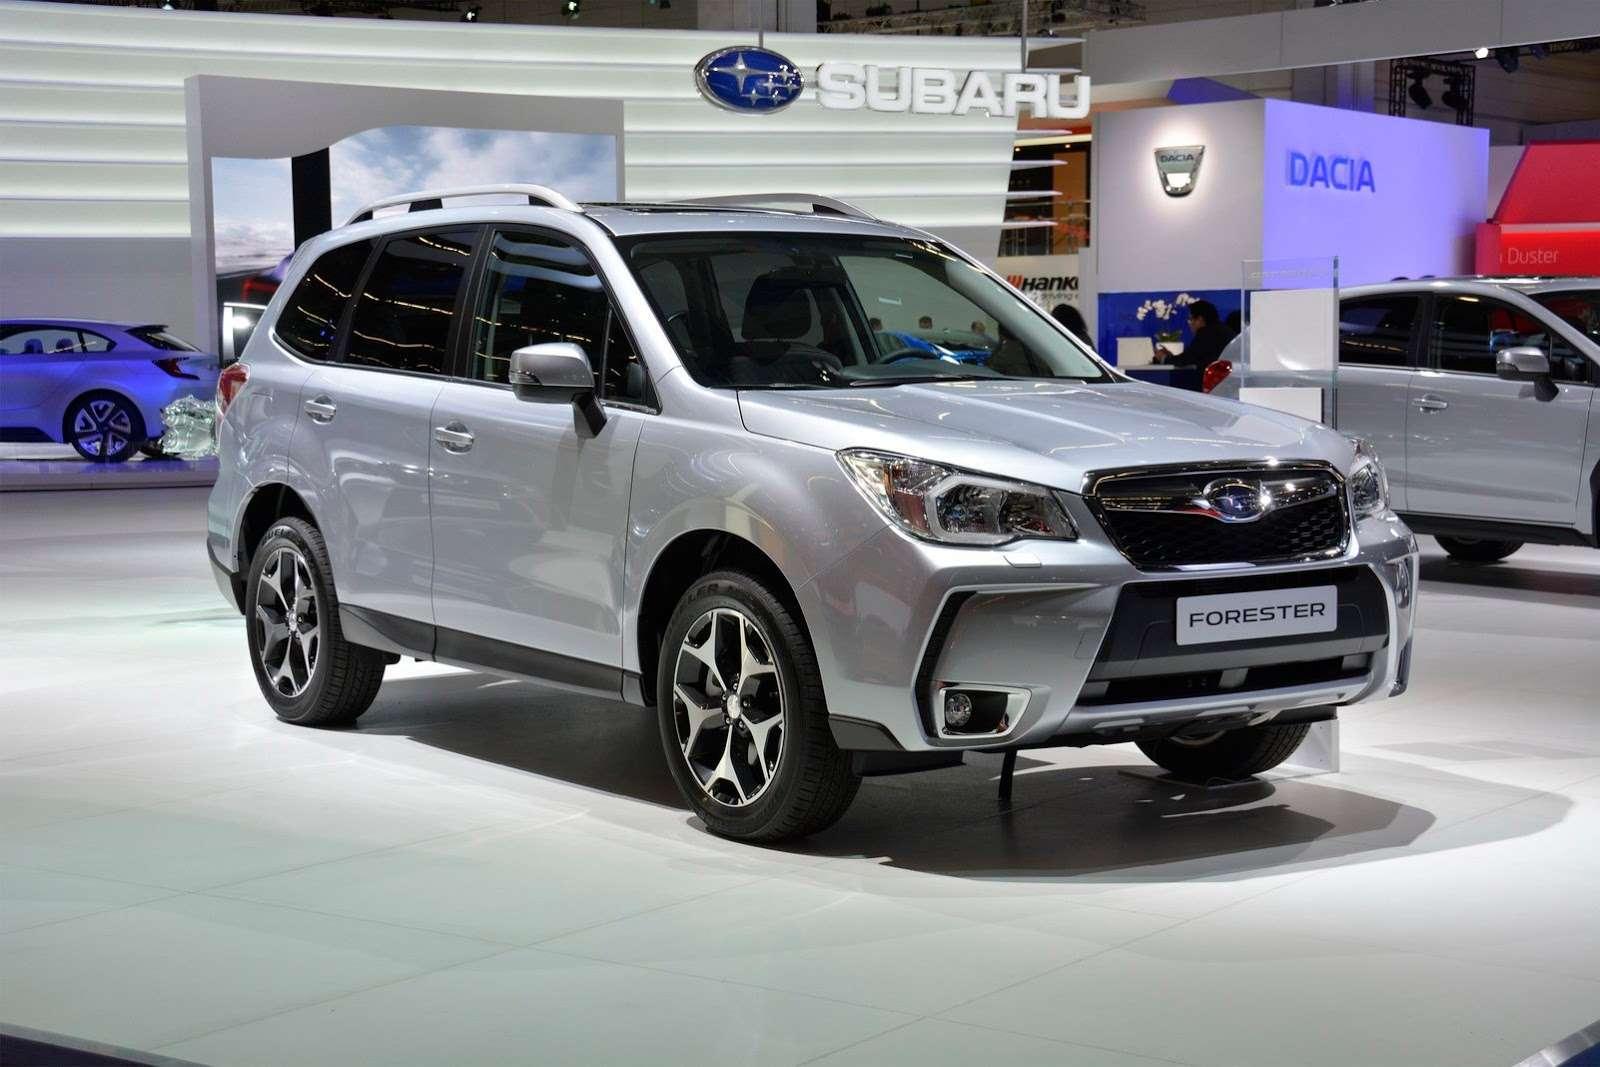 Subaru Forester Frankfurt